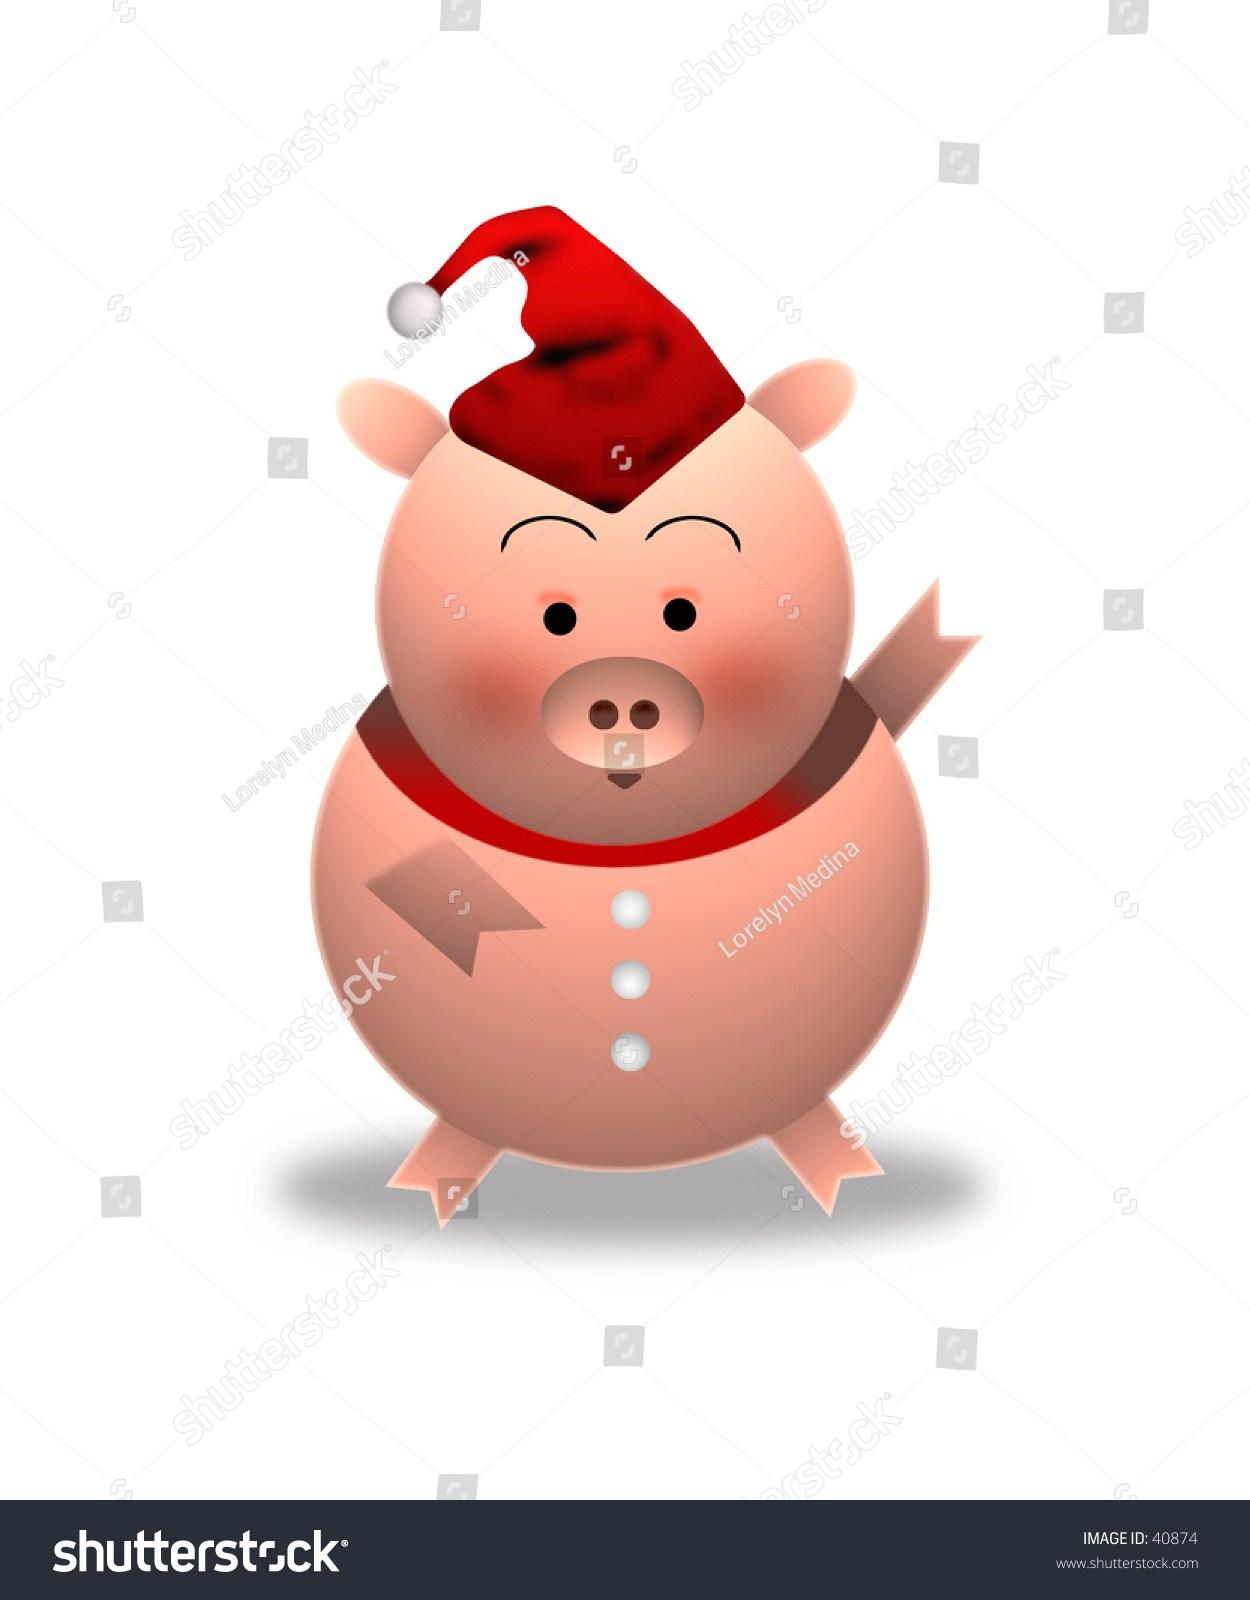 Christmas pig clipart 7 » Clipart Portal.